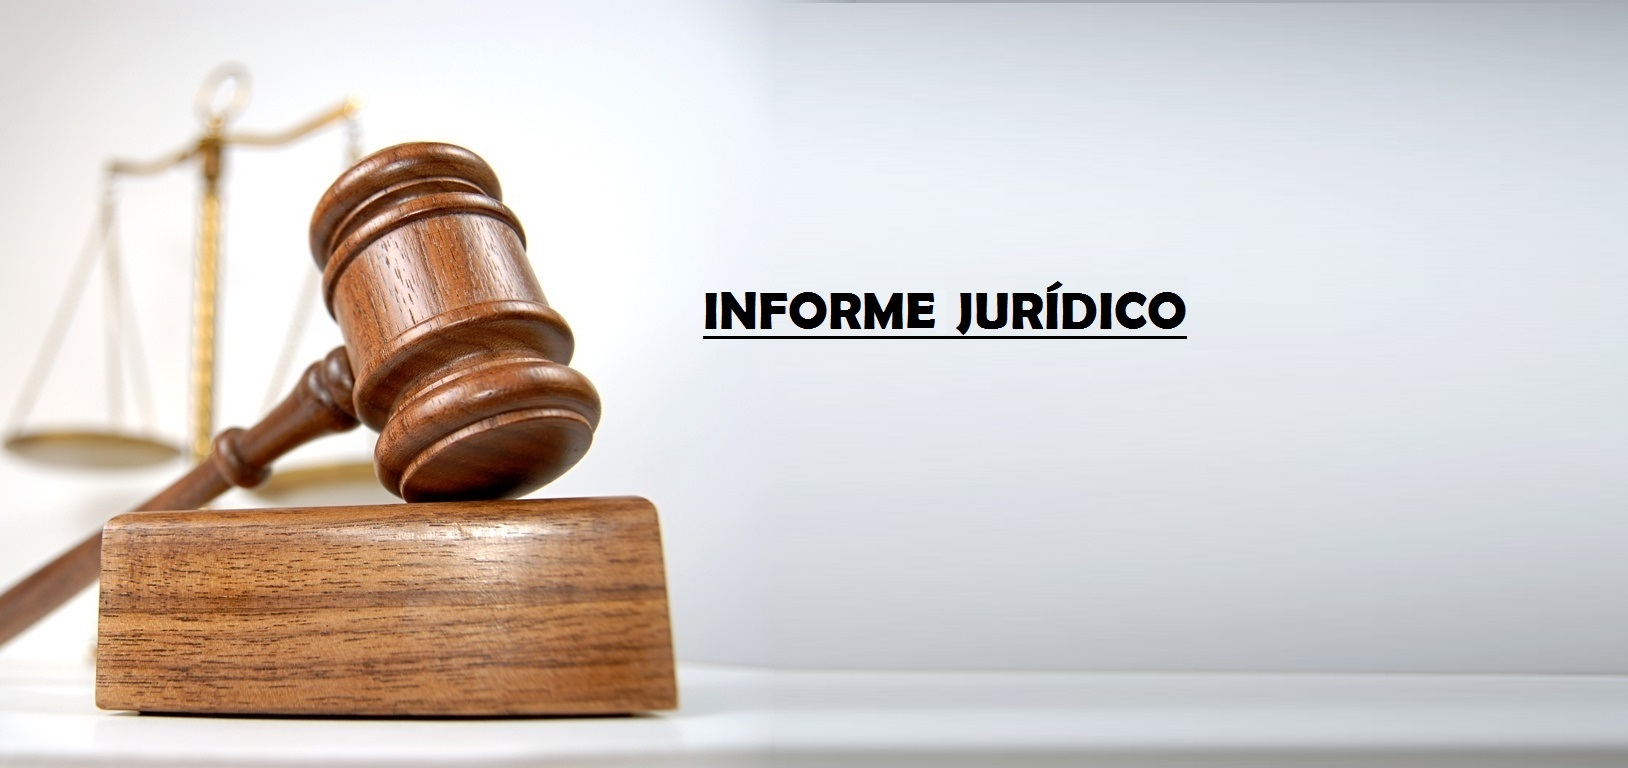 Nota Jurídica: ASBIN esclarece sentença sobre reajuste da Geap